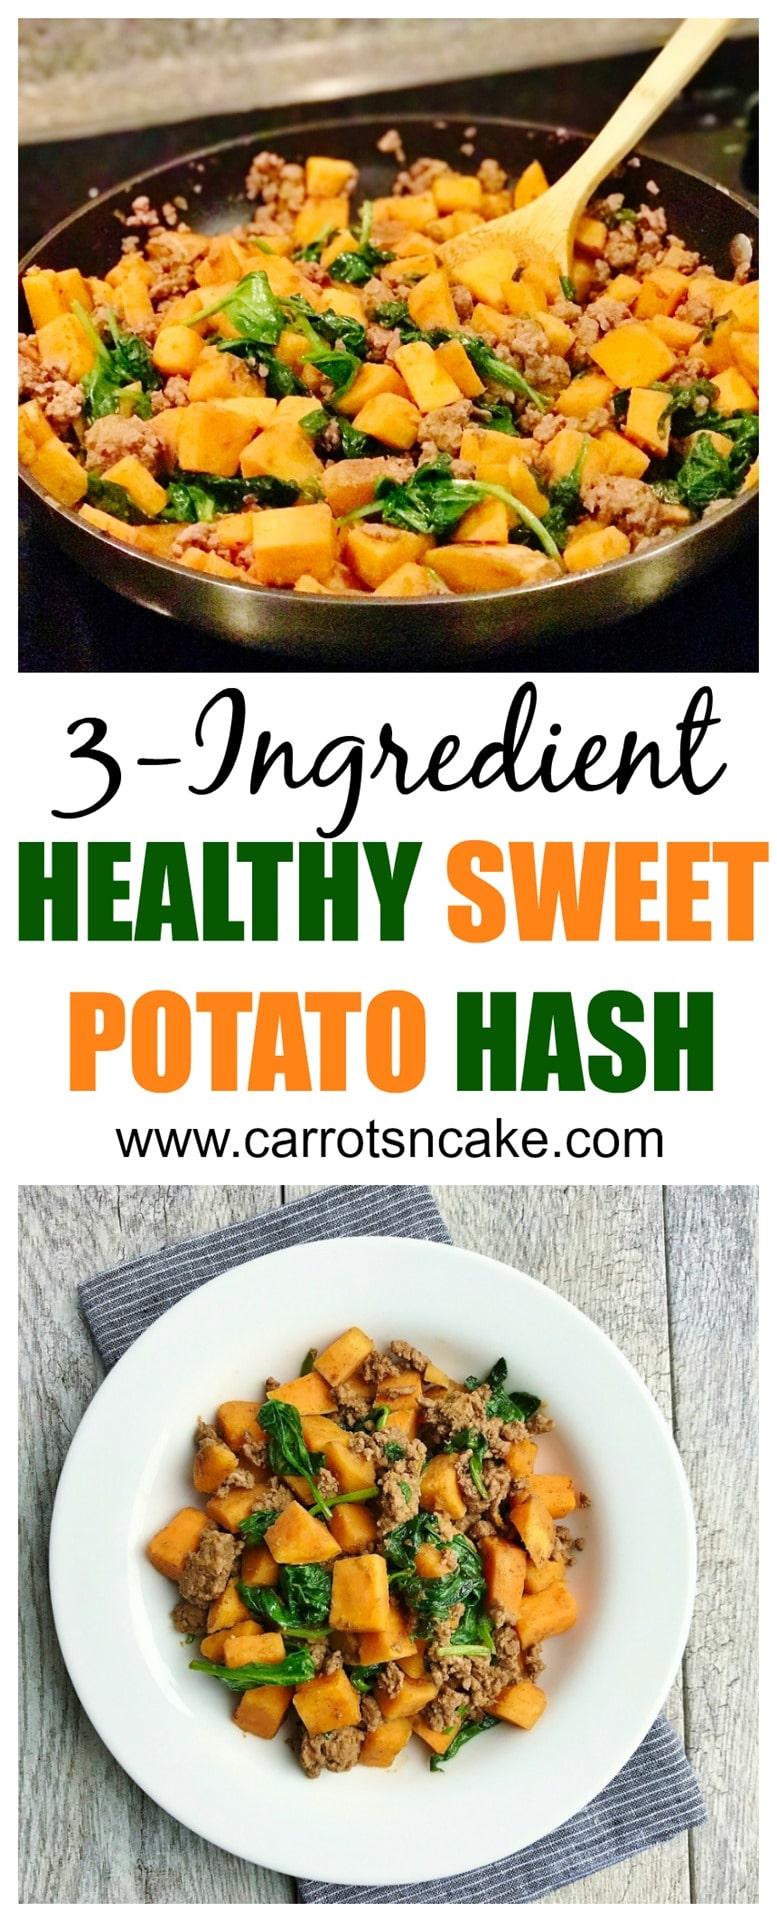 3-Ingredient Healthy Sweet Potato Hash